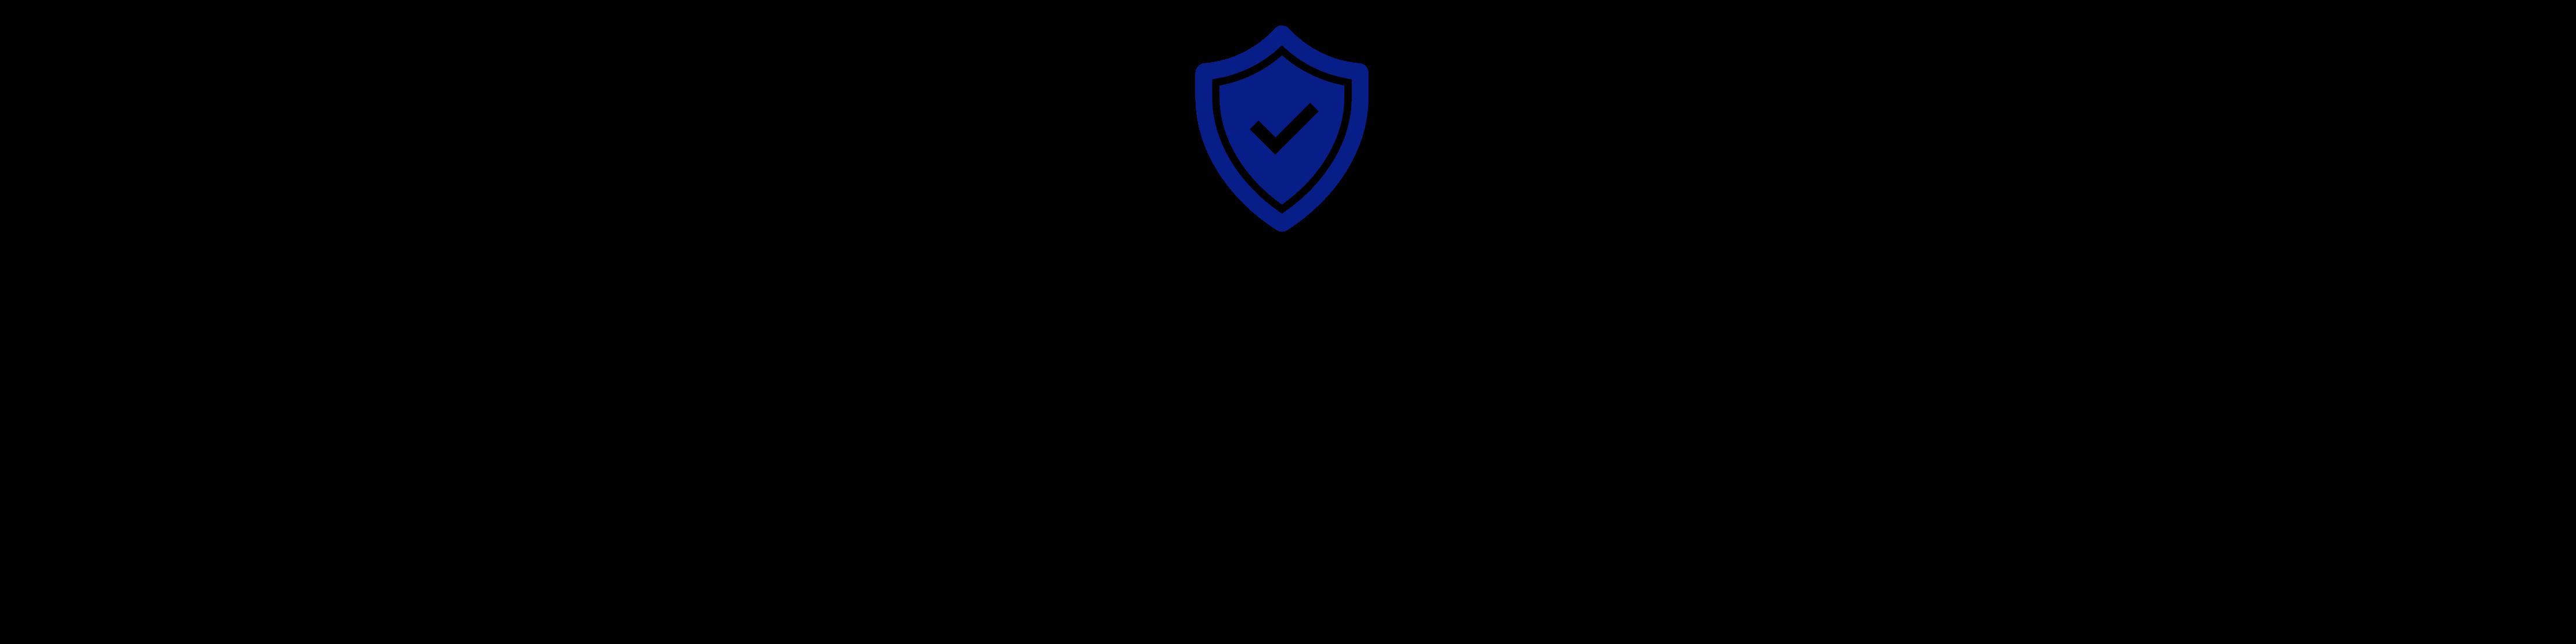 Microsoft Sicherheits-Logo